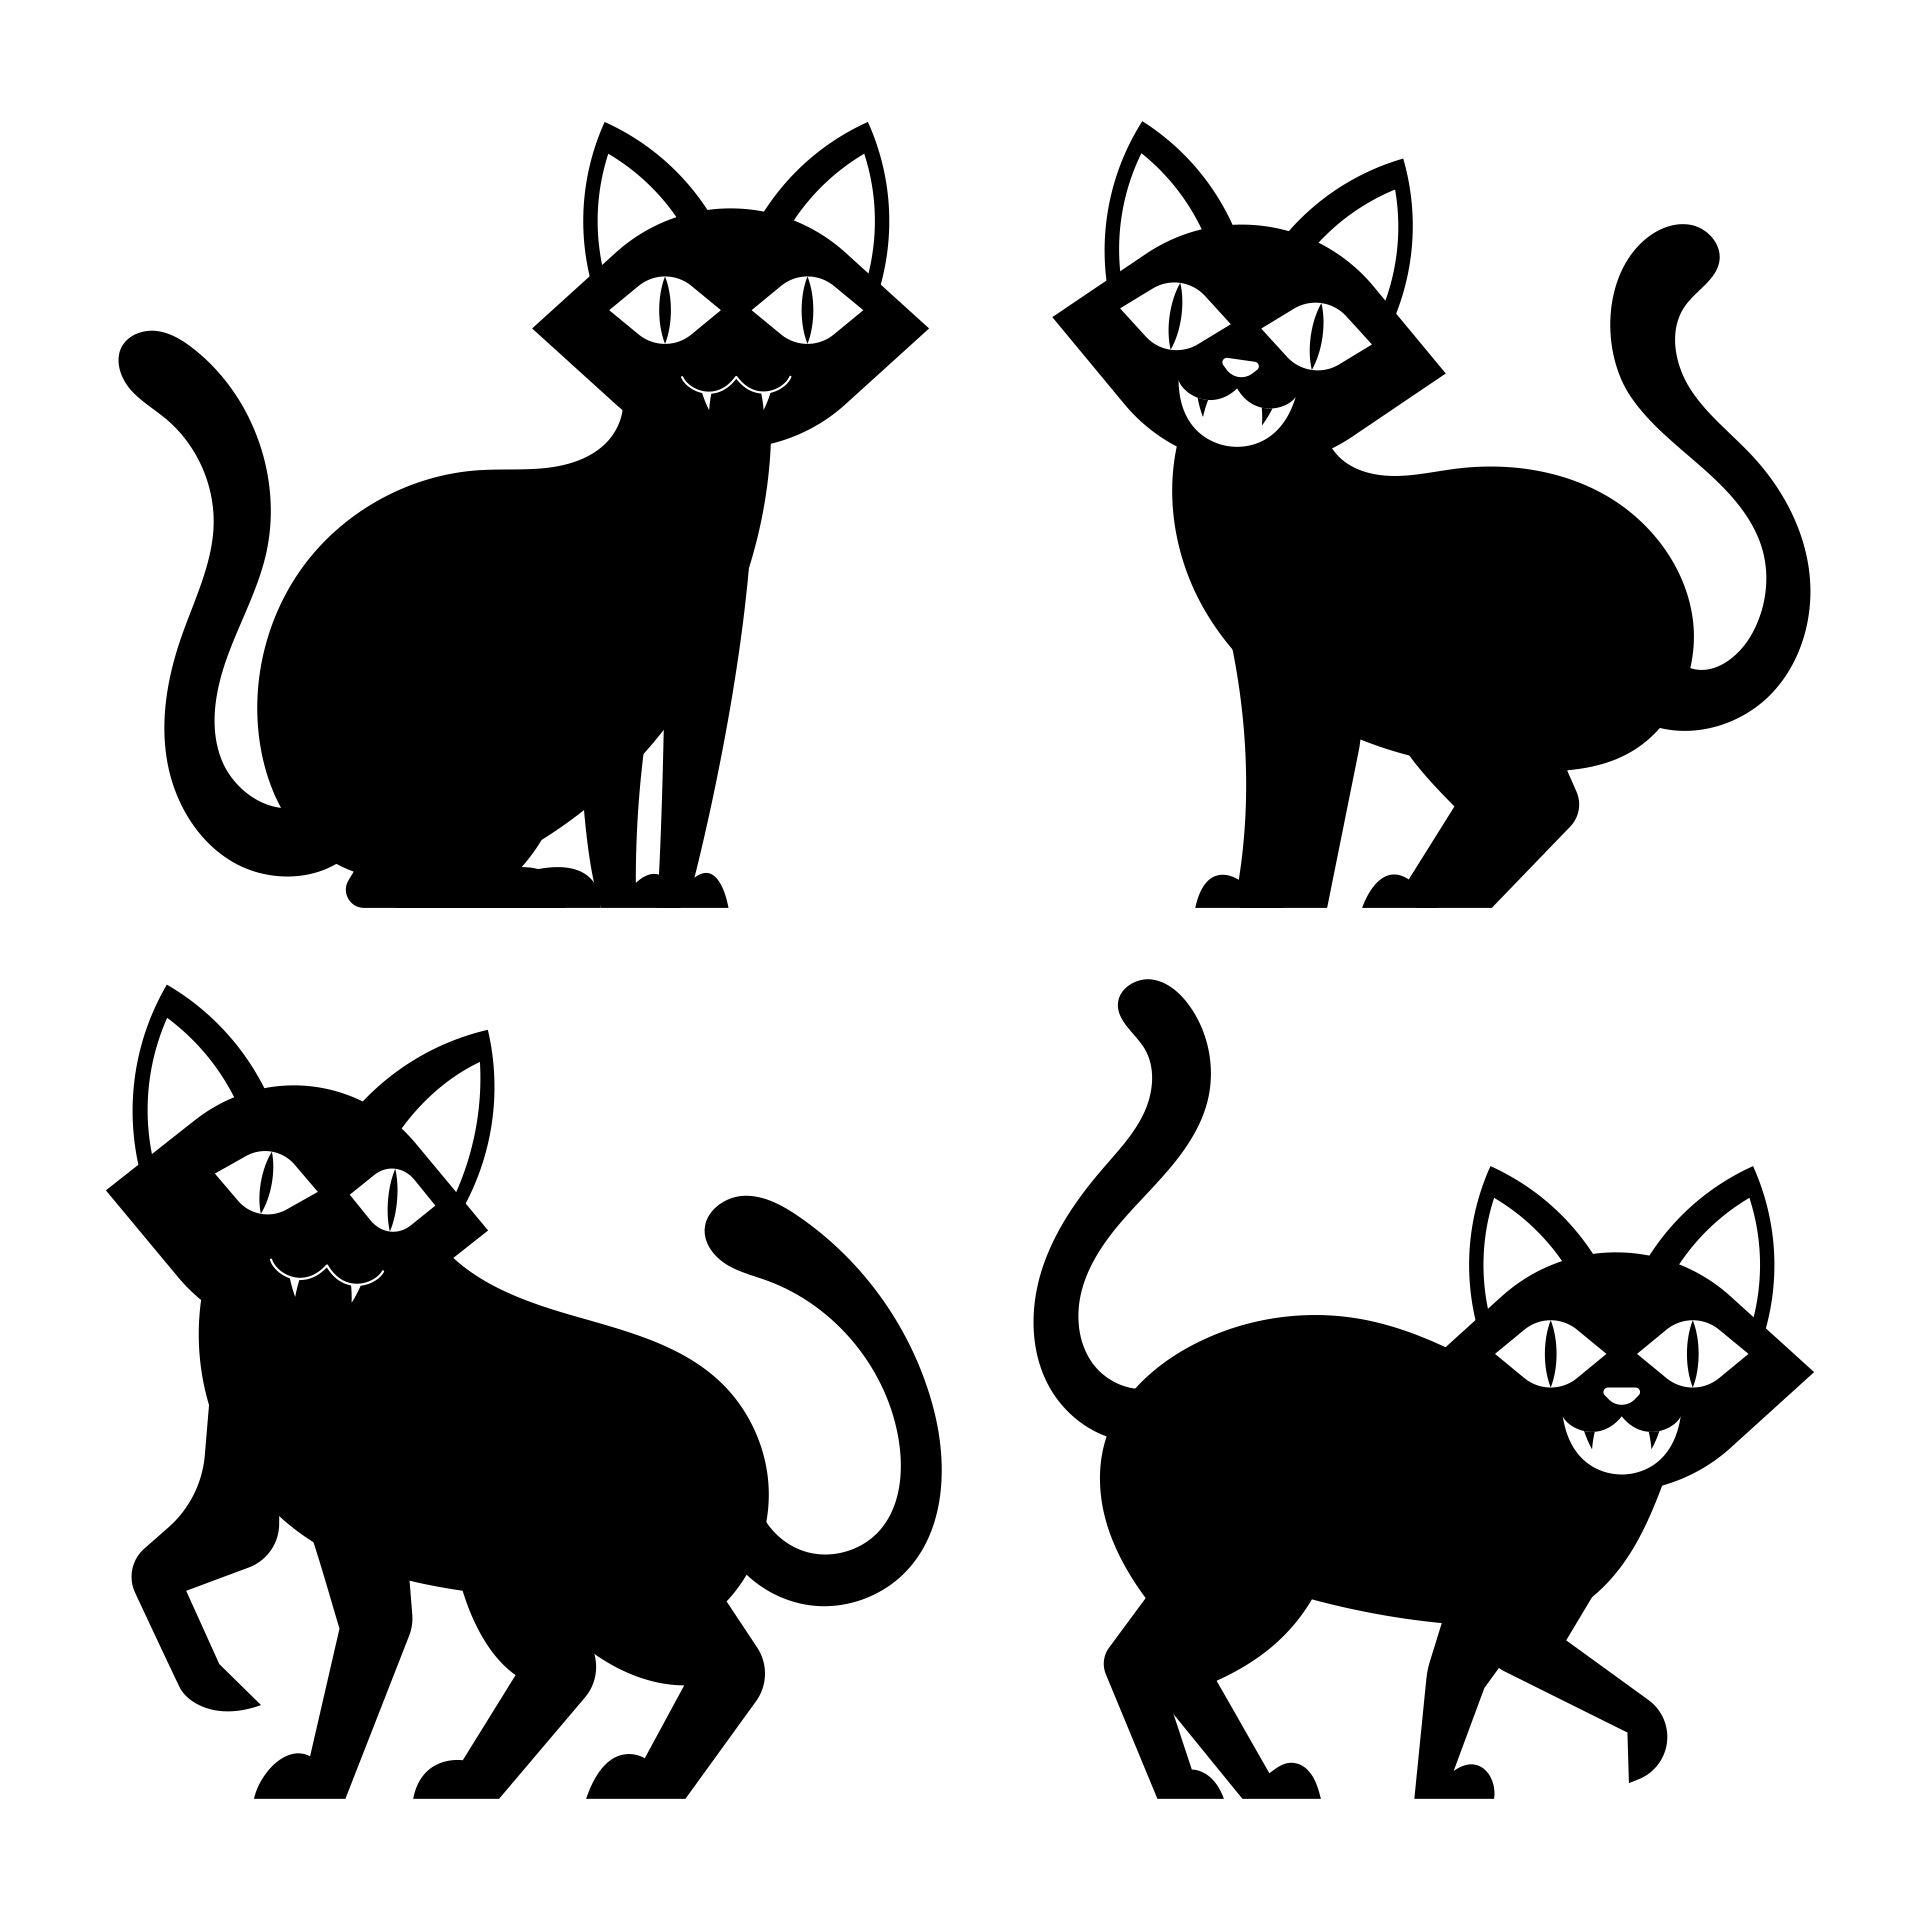 Cute Halloween Cat Silhouette